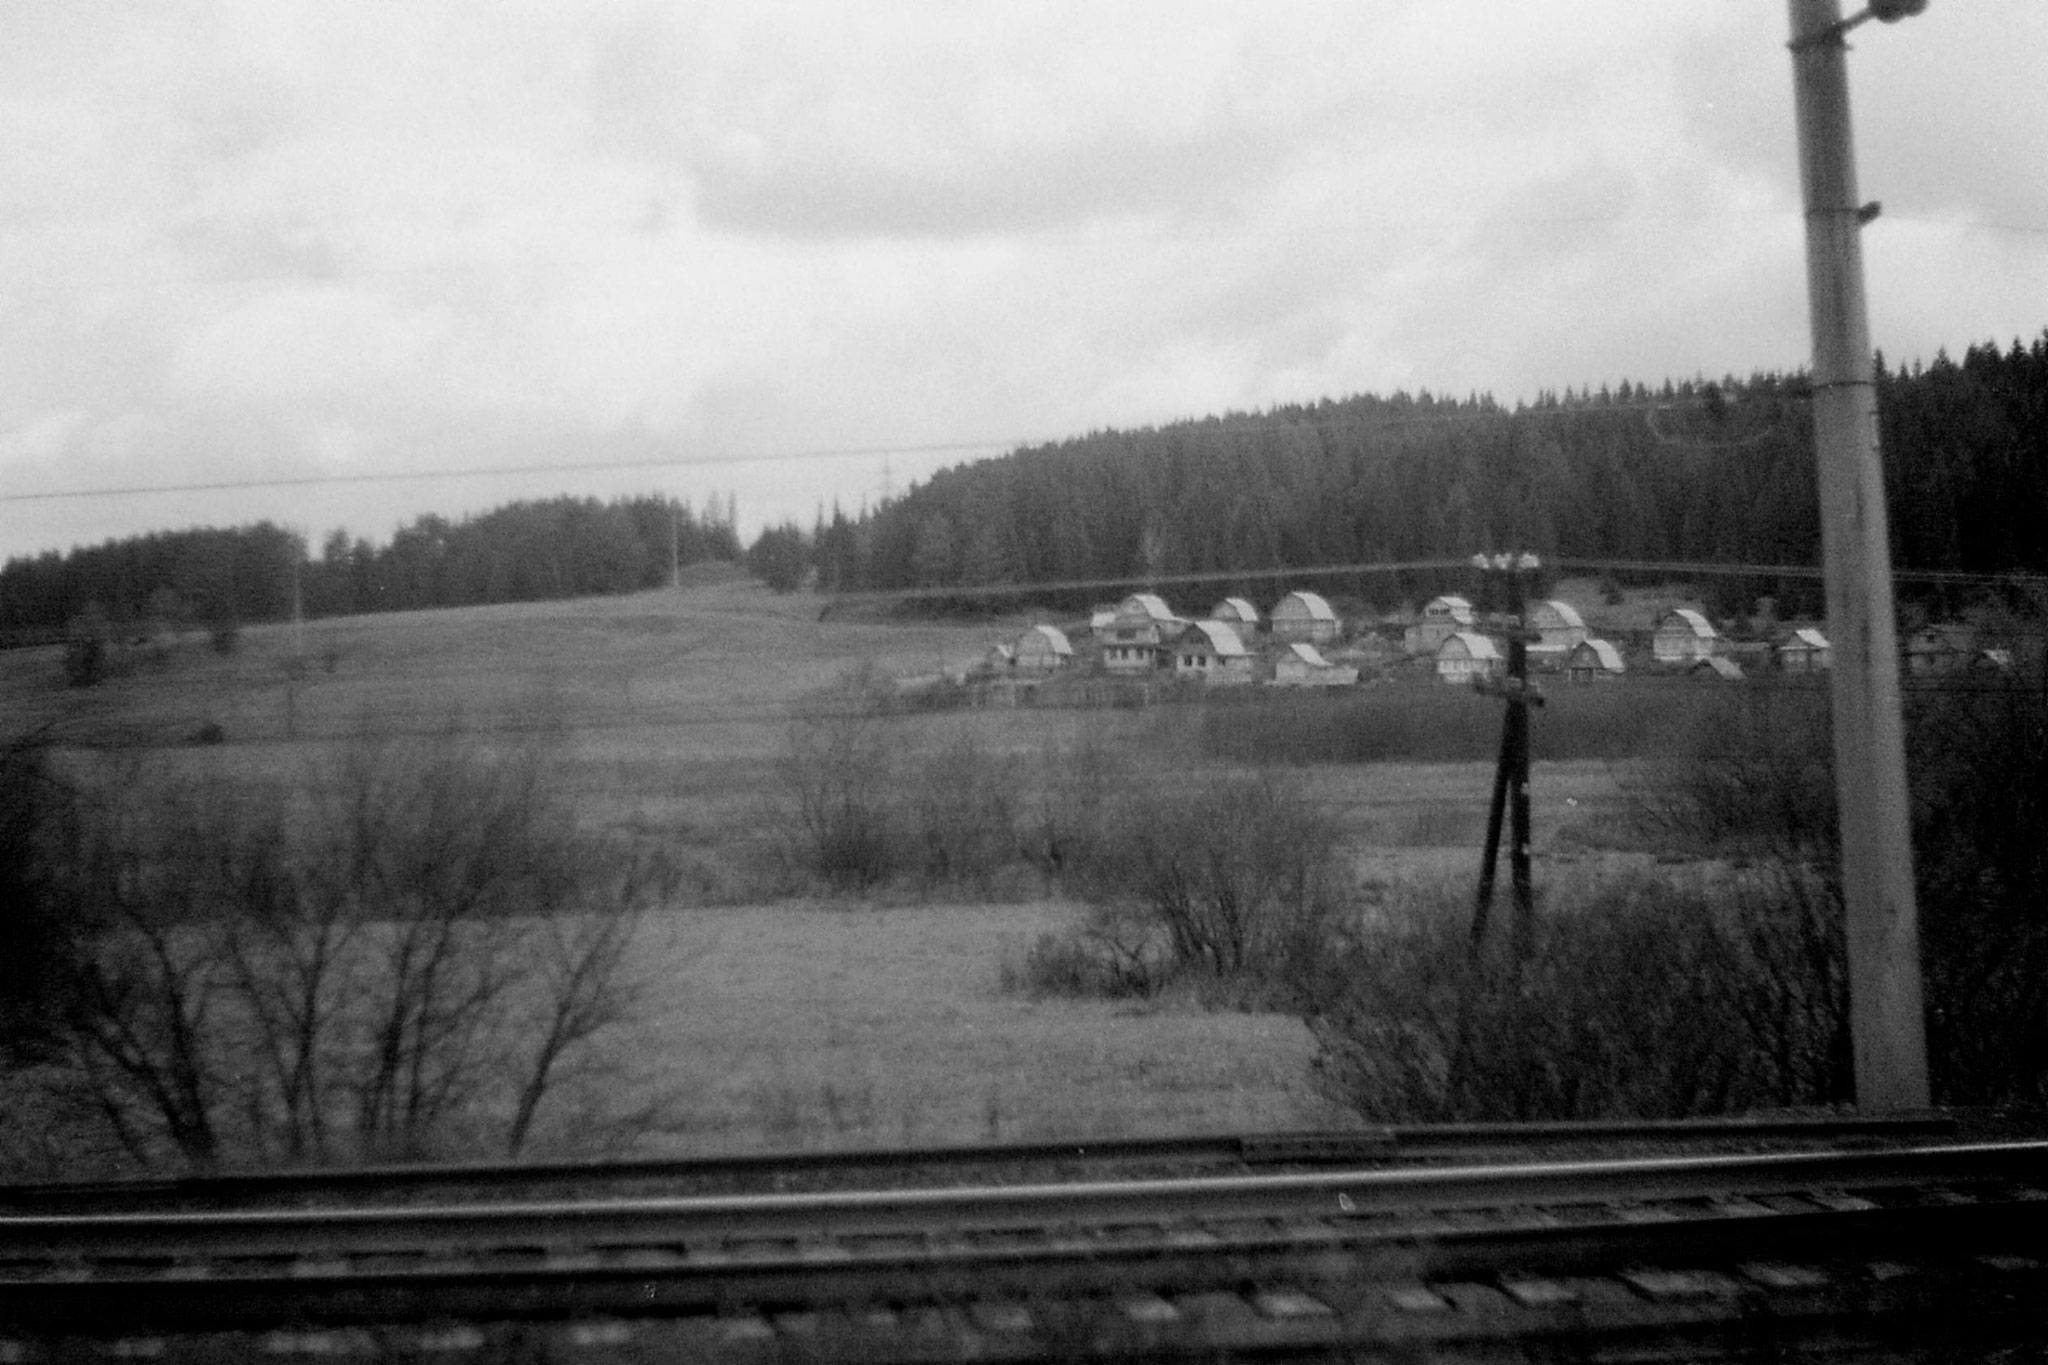 19/10/1988: 25: from Siberian Express between Balezino and Perm